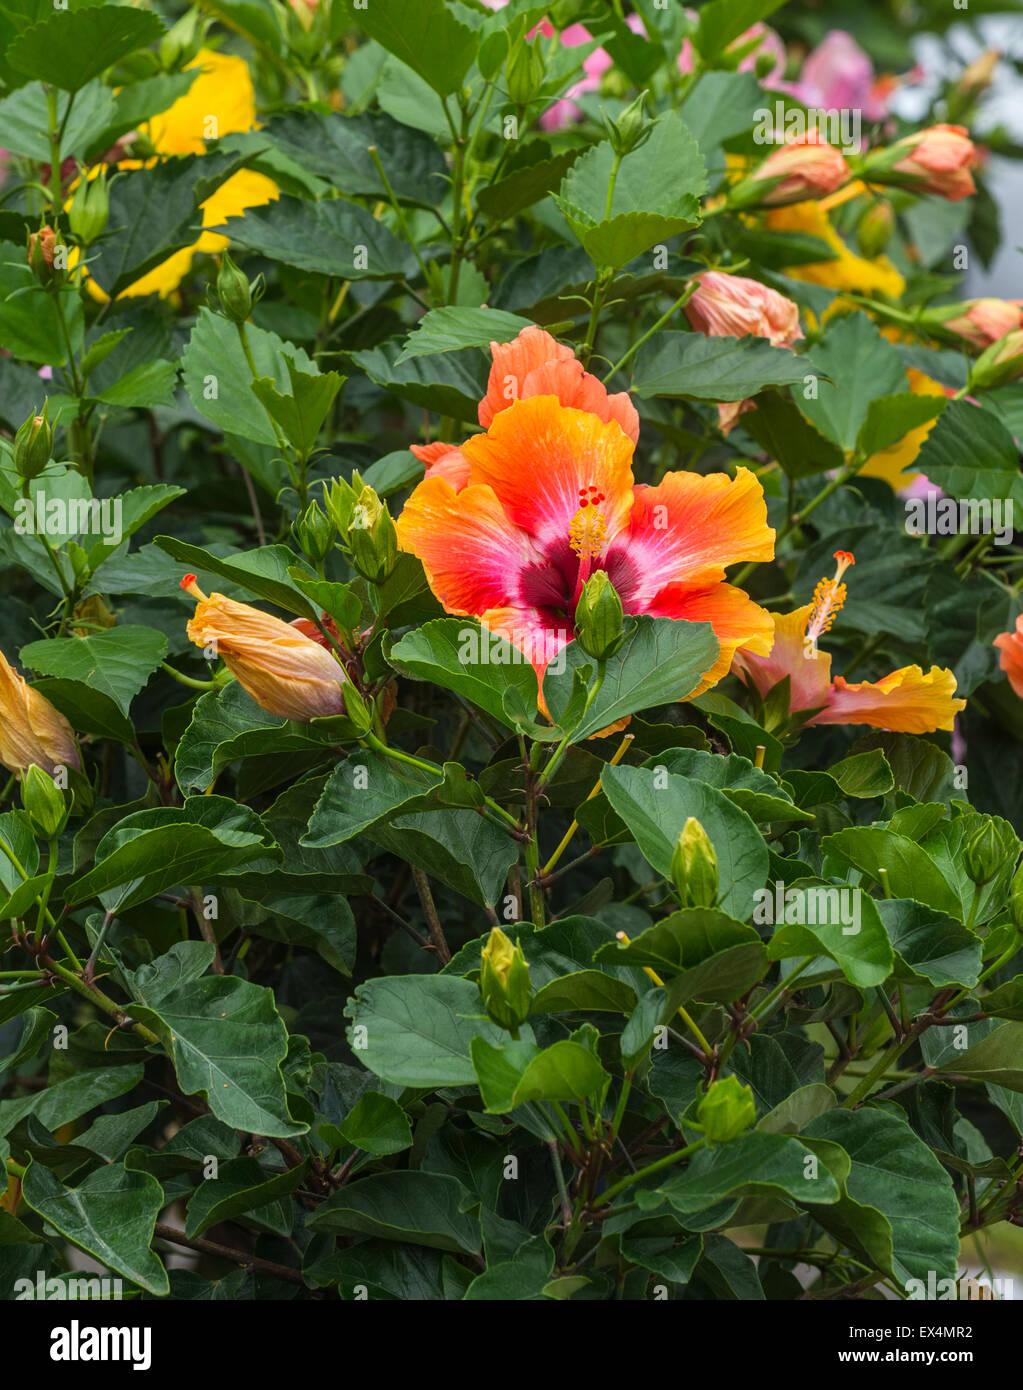 Flowering hibiscus plants for sale at pioneer days festival in high flowering hibiscus plants for sale at pioneer days festival in high springs florida izmirmasajfo